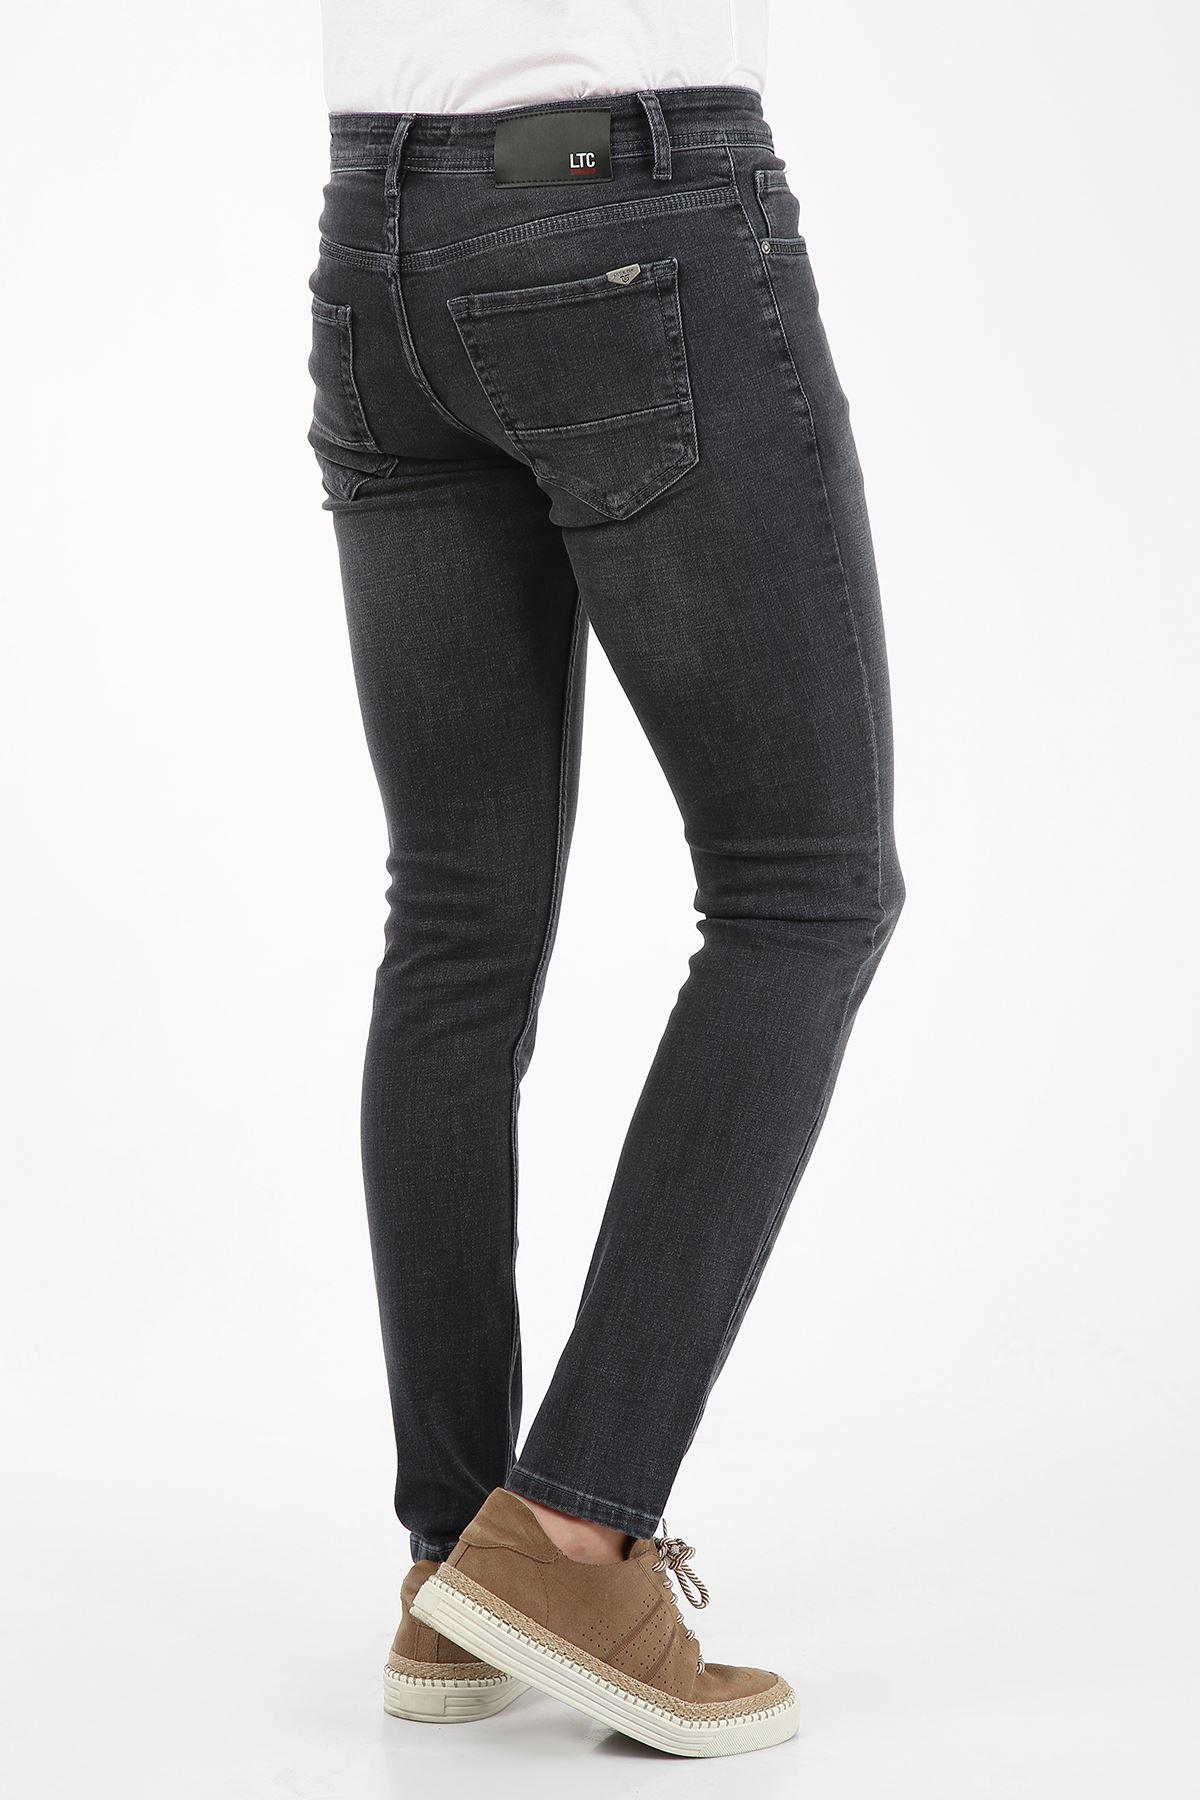 Blue Black Slim Fit Fermuarlı Erkek Jeans Pantolon-JONAS